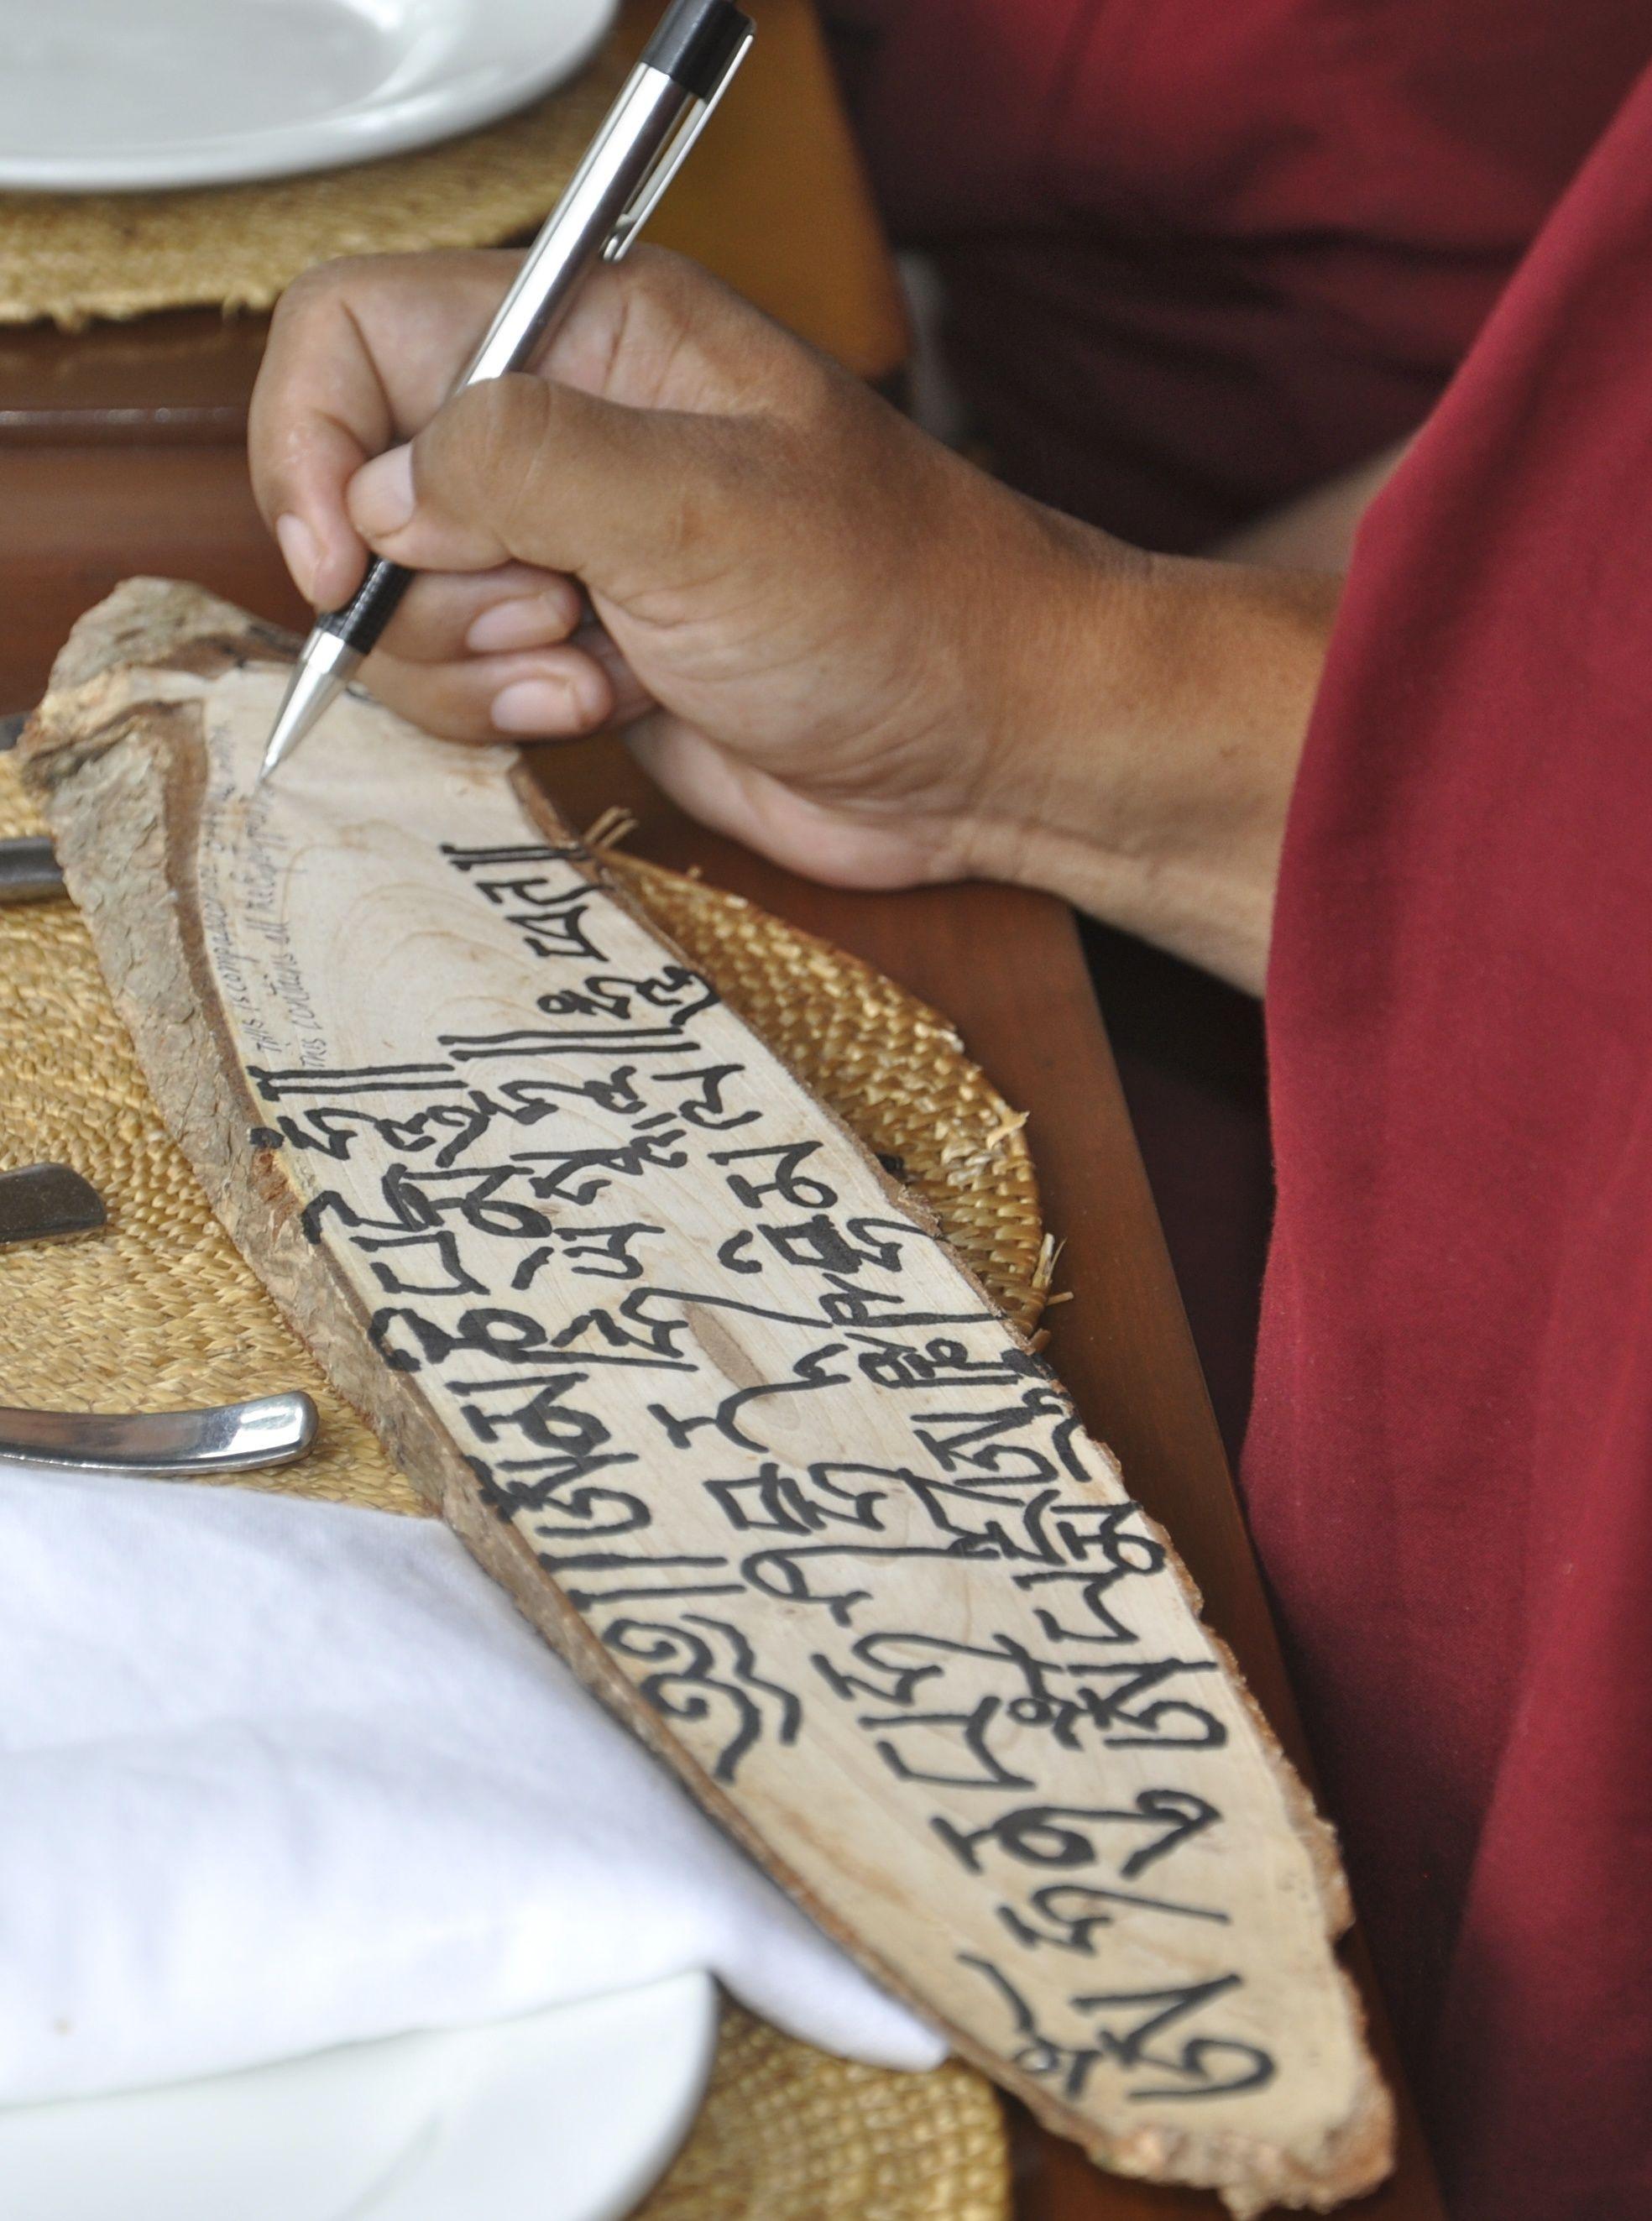 Rinpoche writesmantra on a souvenir plaque in Manali, India, 2015. (Photo Thubten Jangchub)